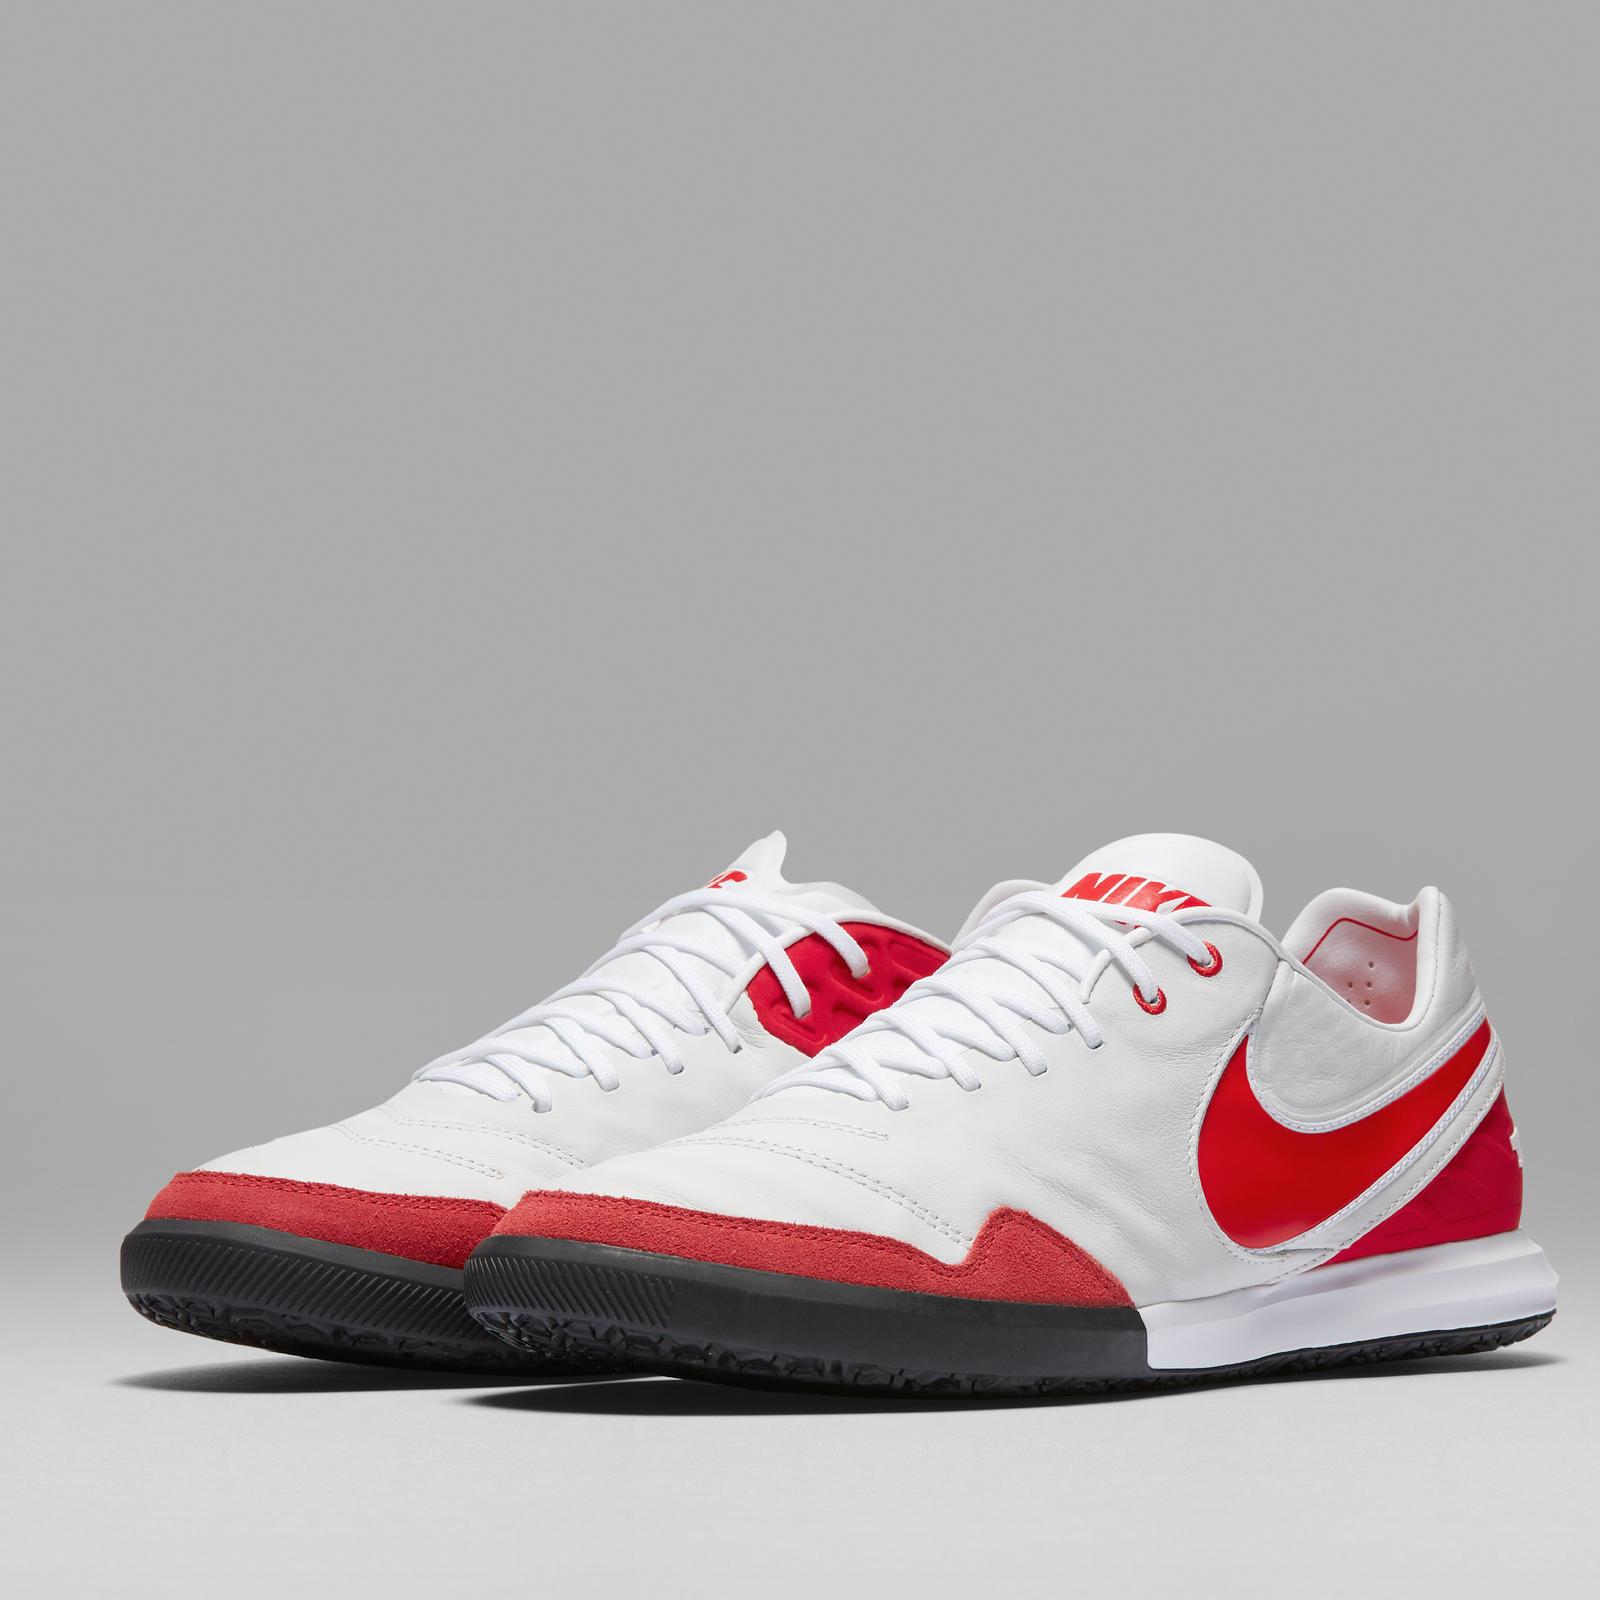 Nike TiempoX Proximo